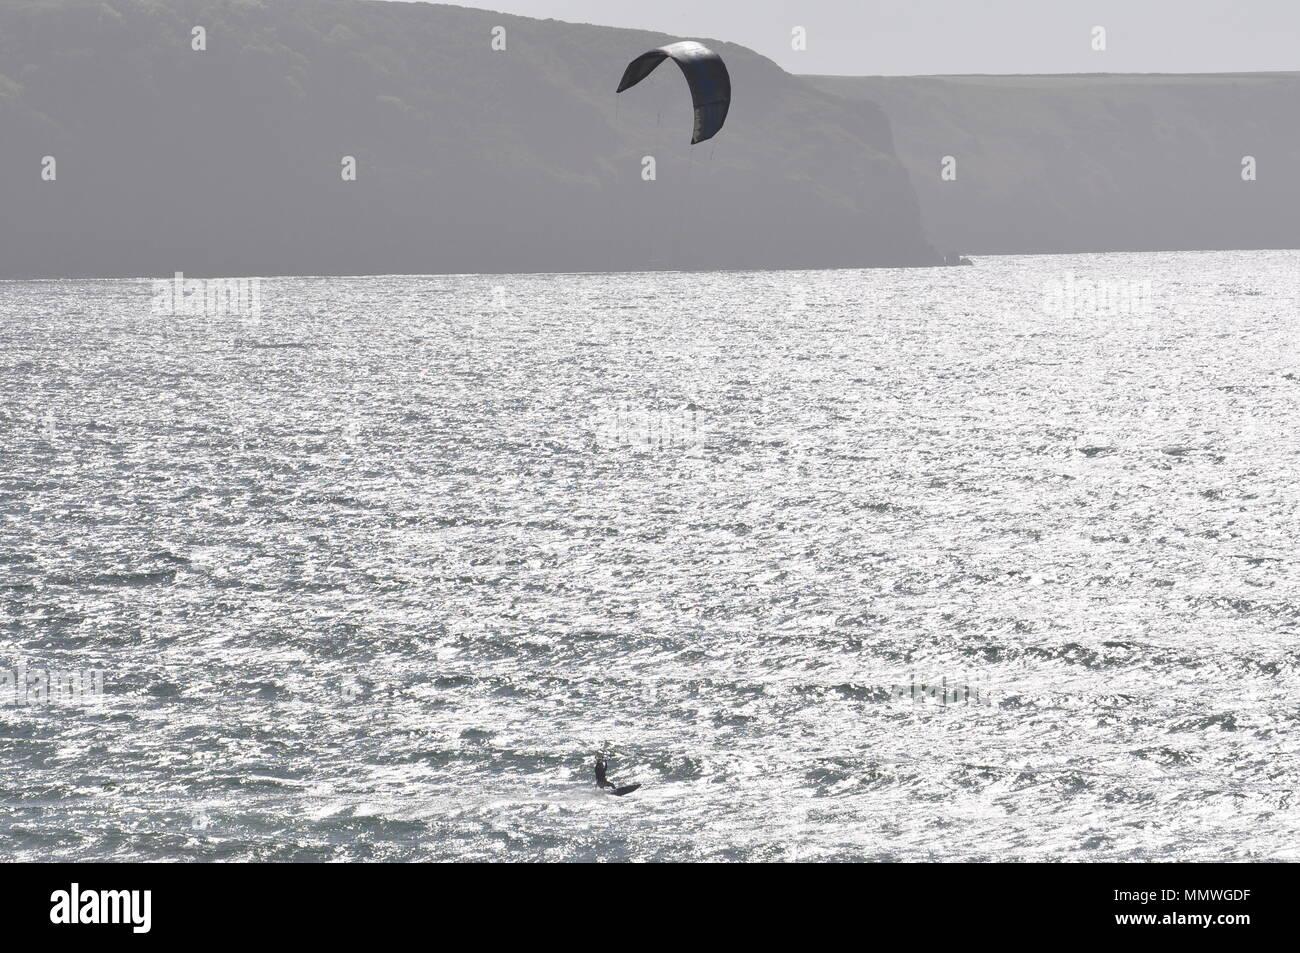 Kite surfer at Broad Haven Pembrokeshire Wales UK - Stock Image